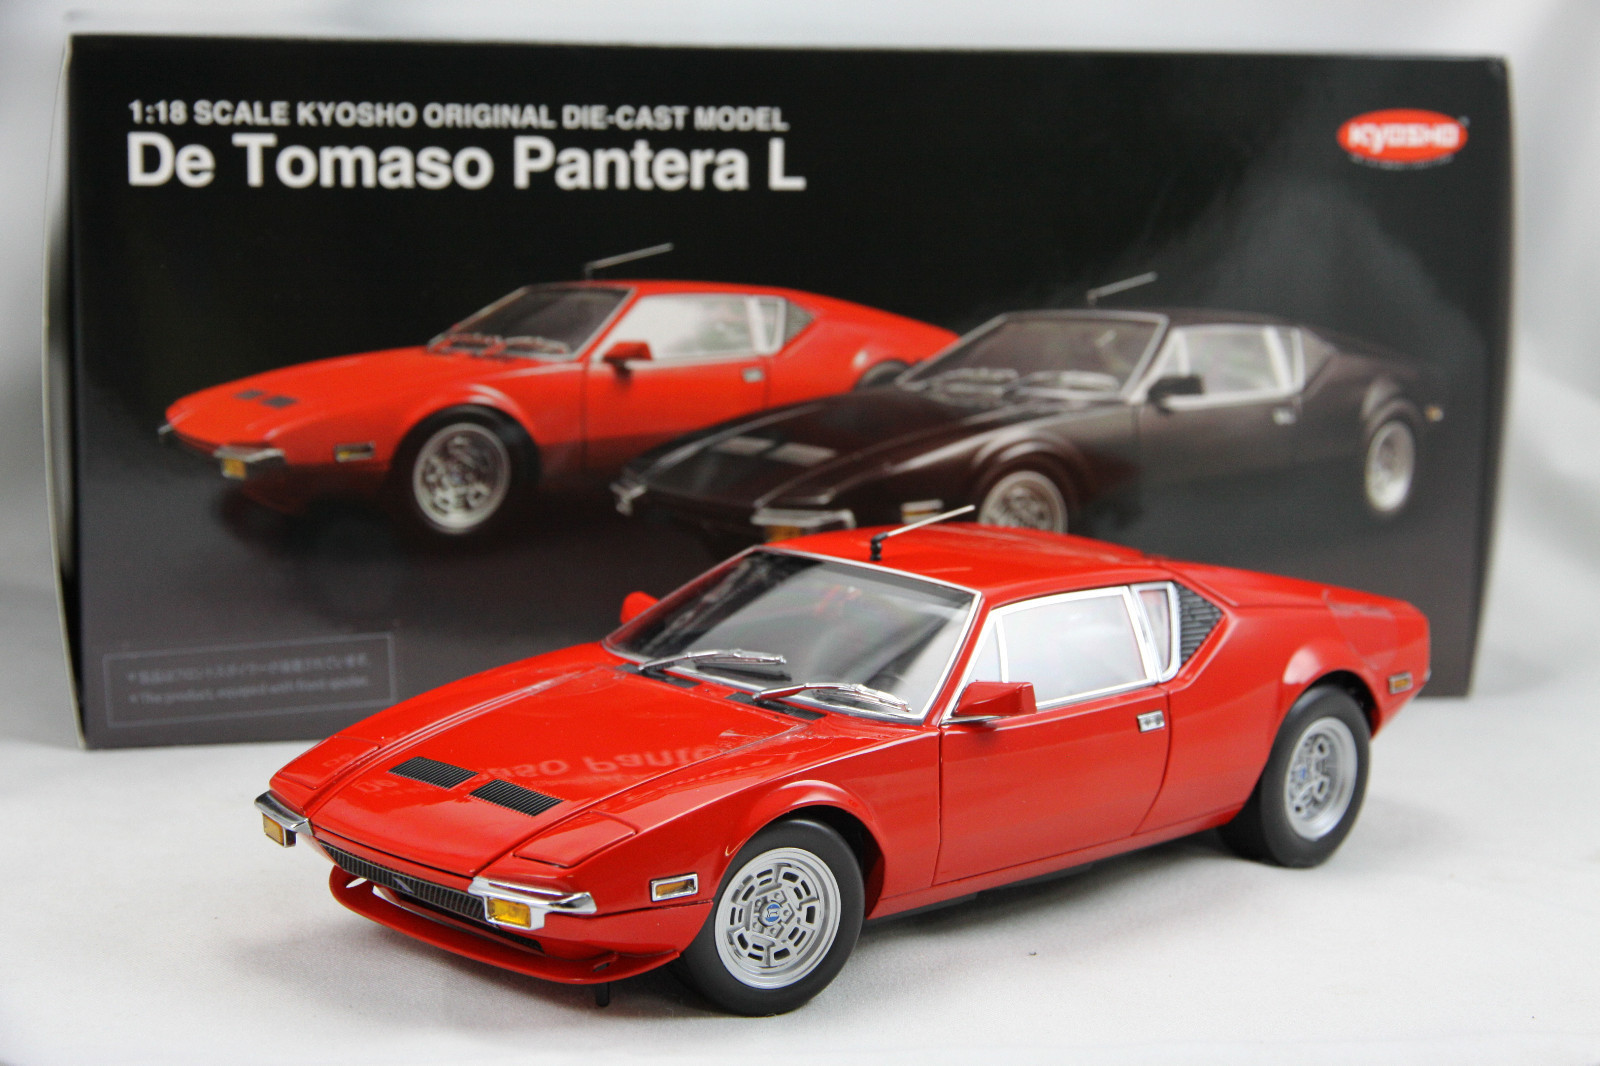 De Tomaso Pantera Revived By Gorgeous Scale Model